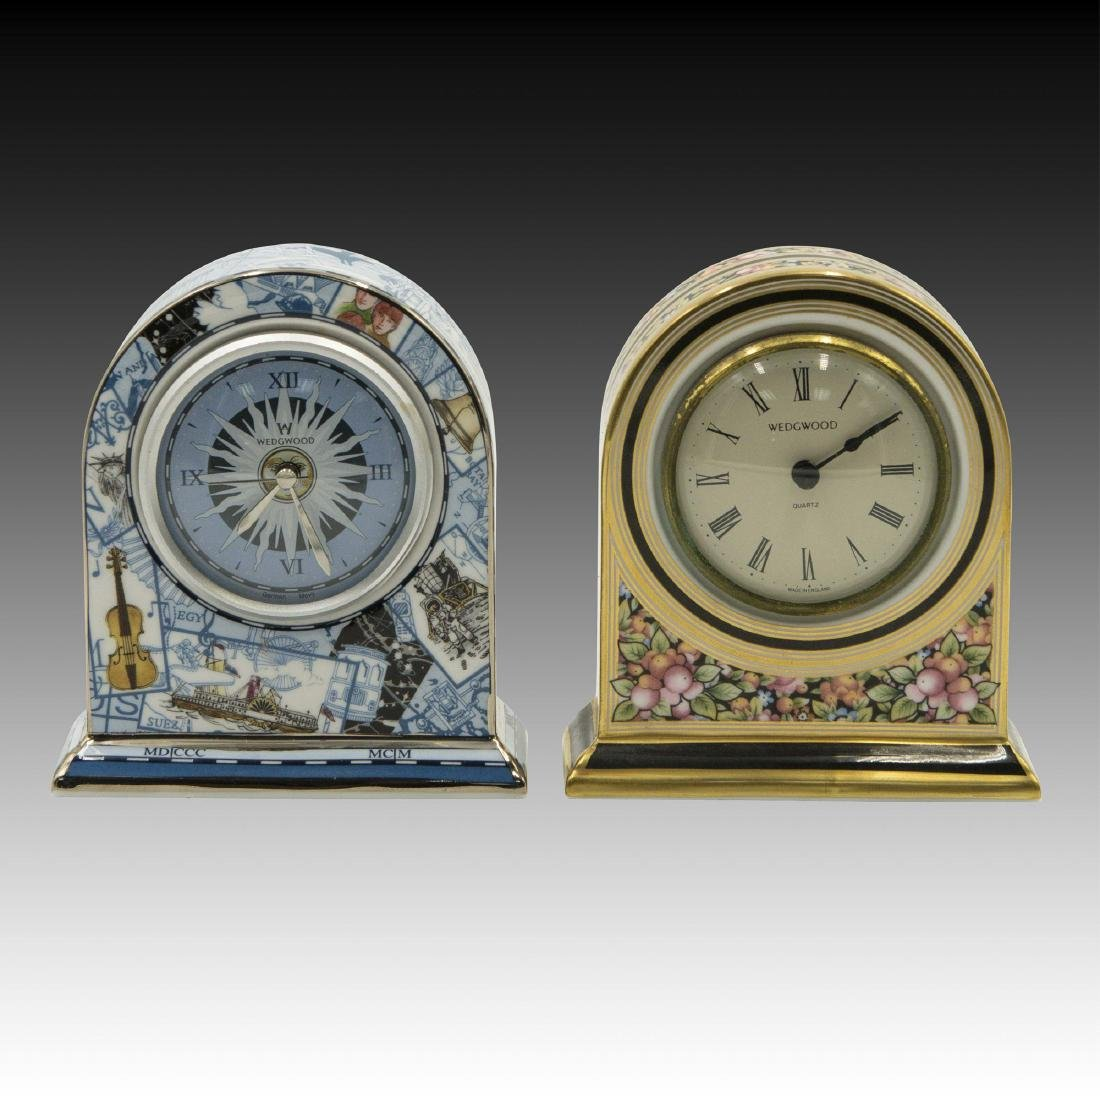 Pair of Wedgwood Bone China Clocks